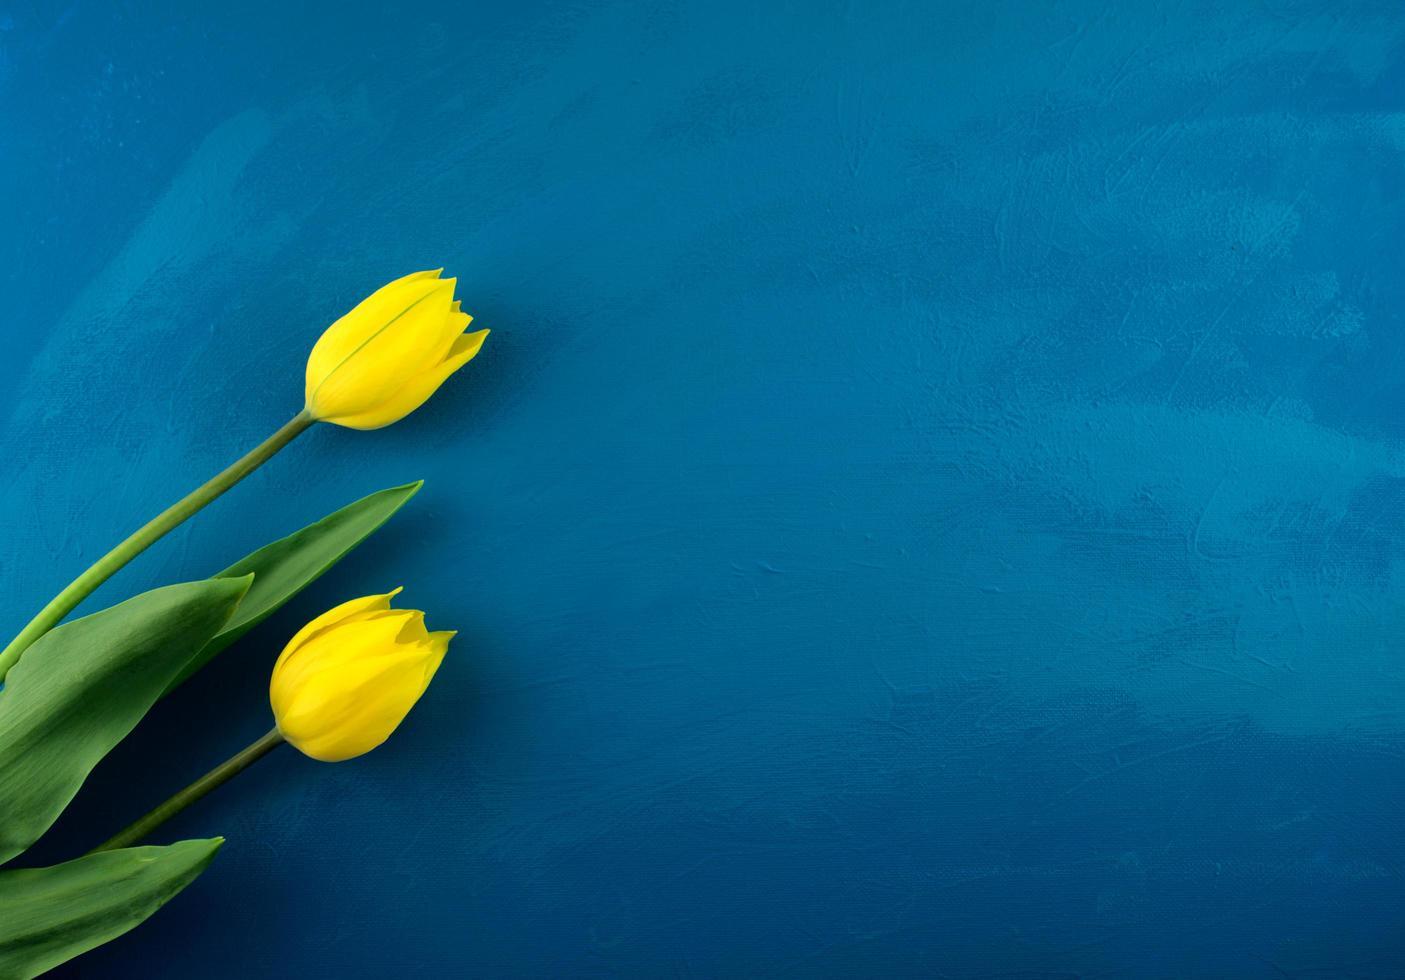 Bright yellow tulip flowers flat lay on handmade classic blue grunge abstract photo